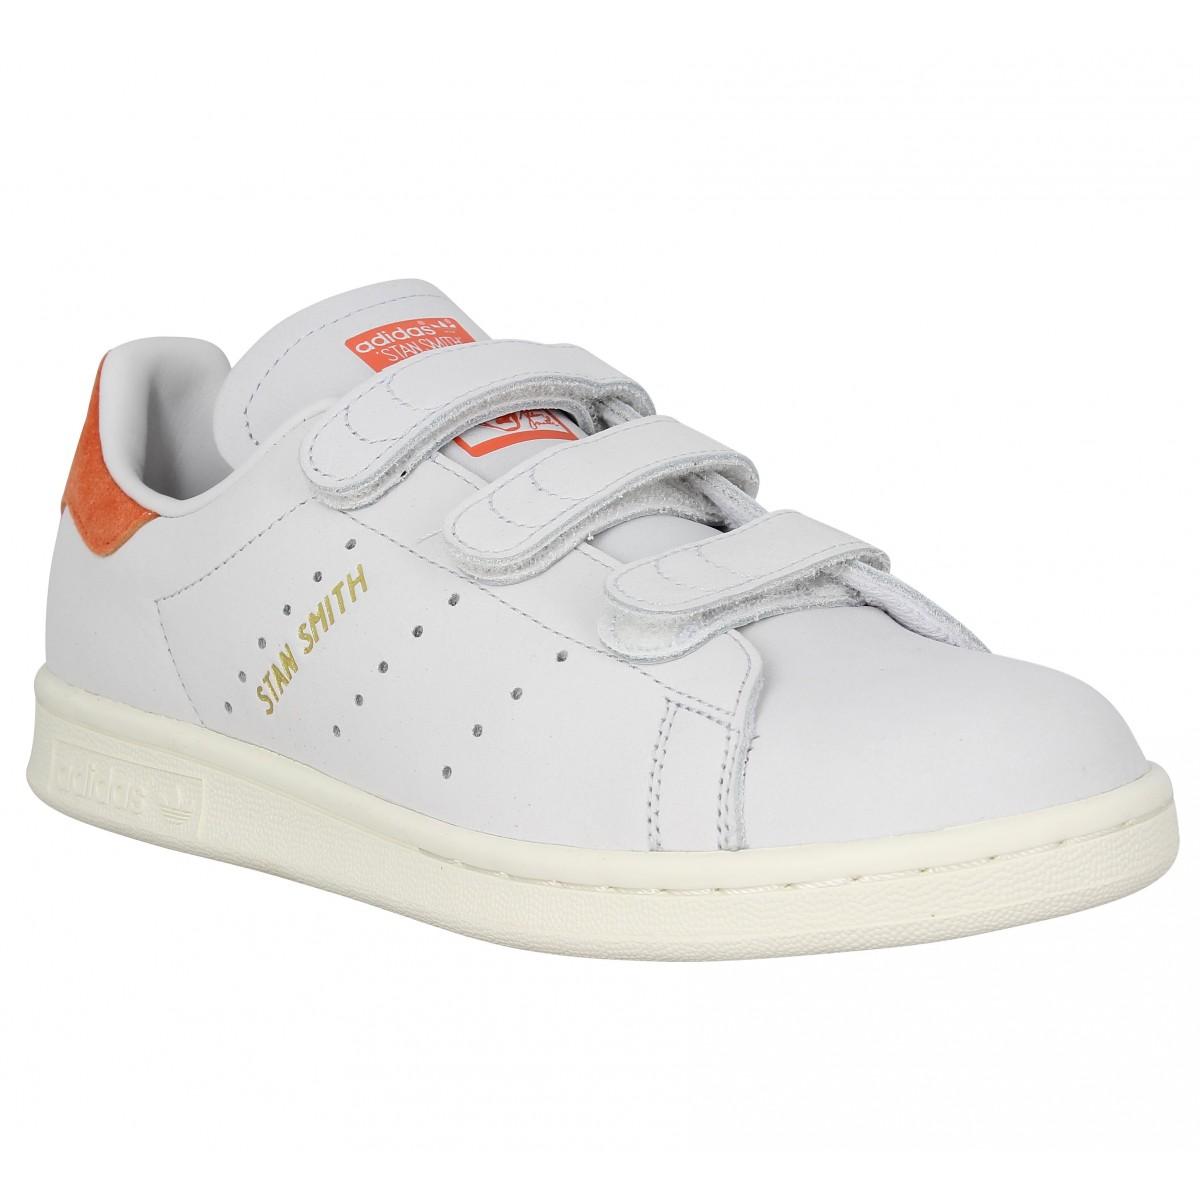 nouveaux styles 8c5f5 2ad9e Chaussures Velour Femme Adidas Stan Smith mPy8n0wOvN